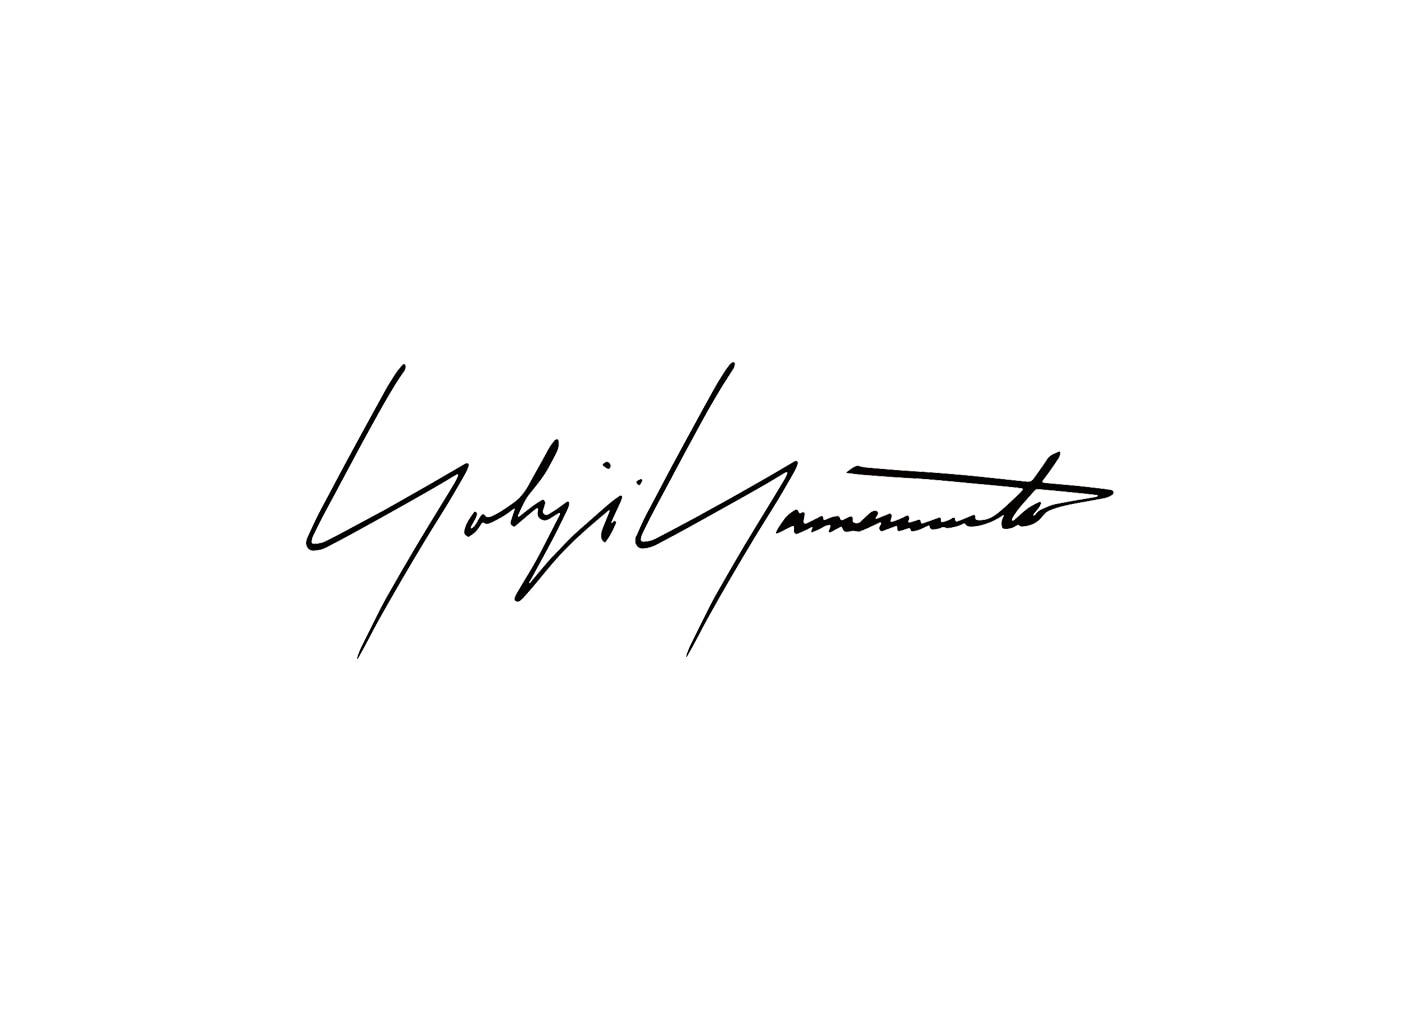 INFORMATION – Yohji Yamamoto AOYAMA 1月17日(日)・1月18日(月)営業時間短縮のお知らせ